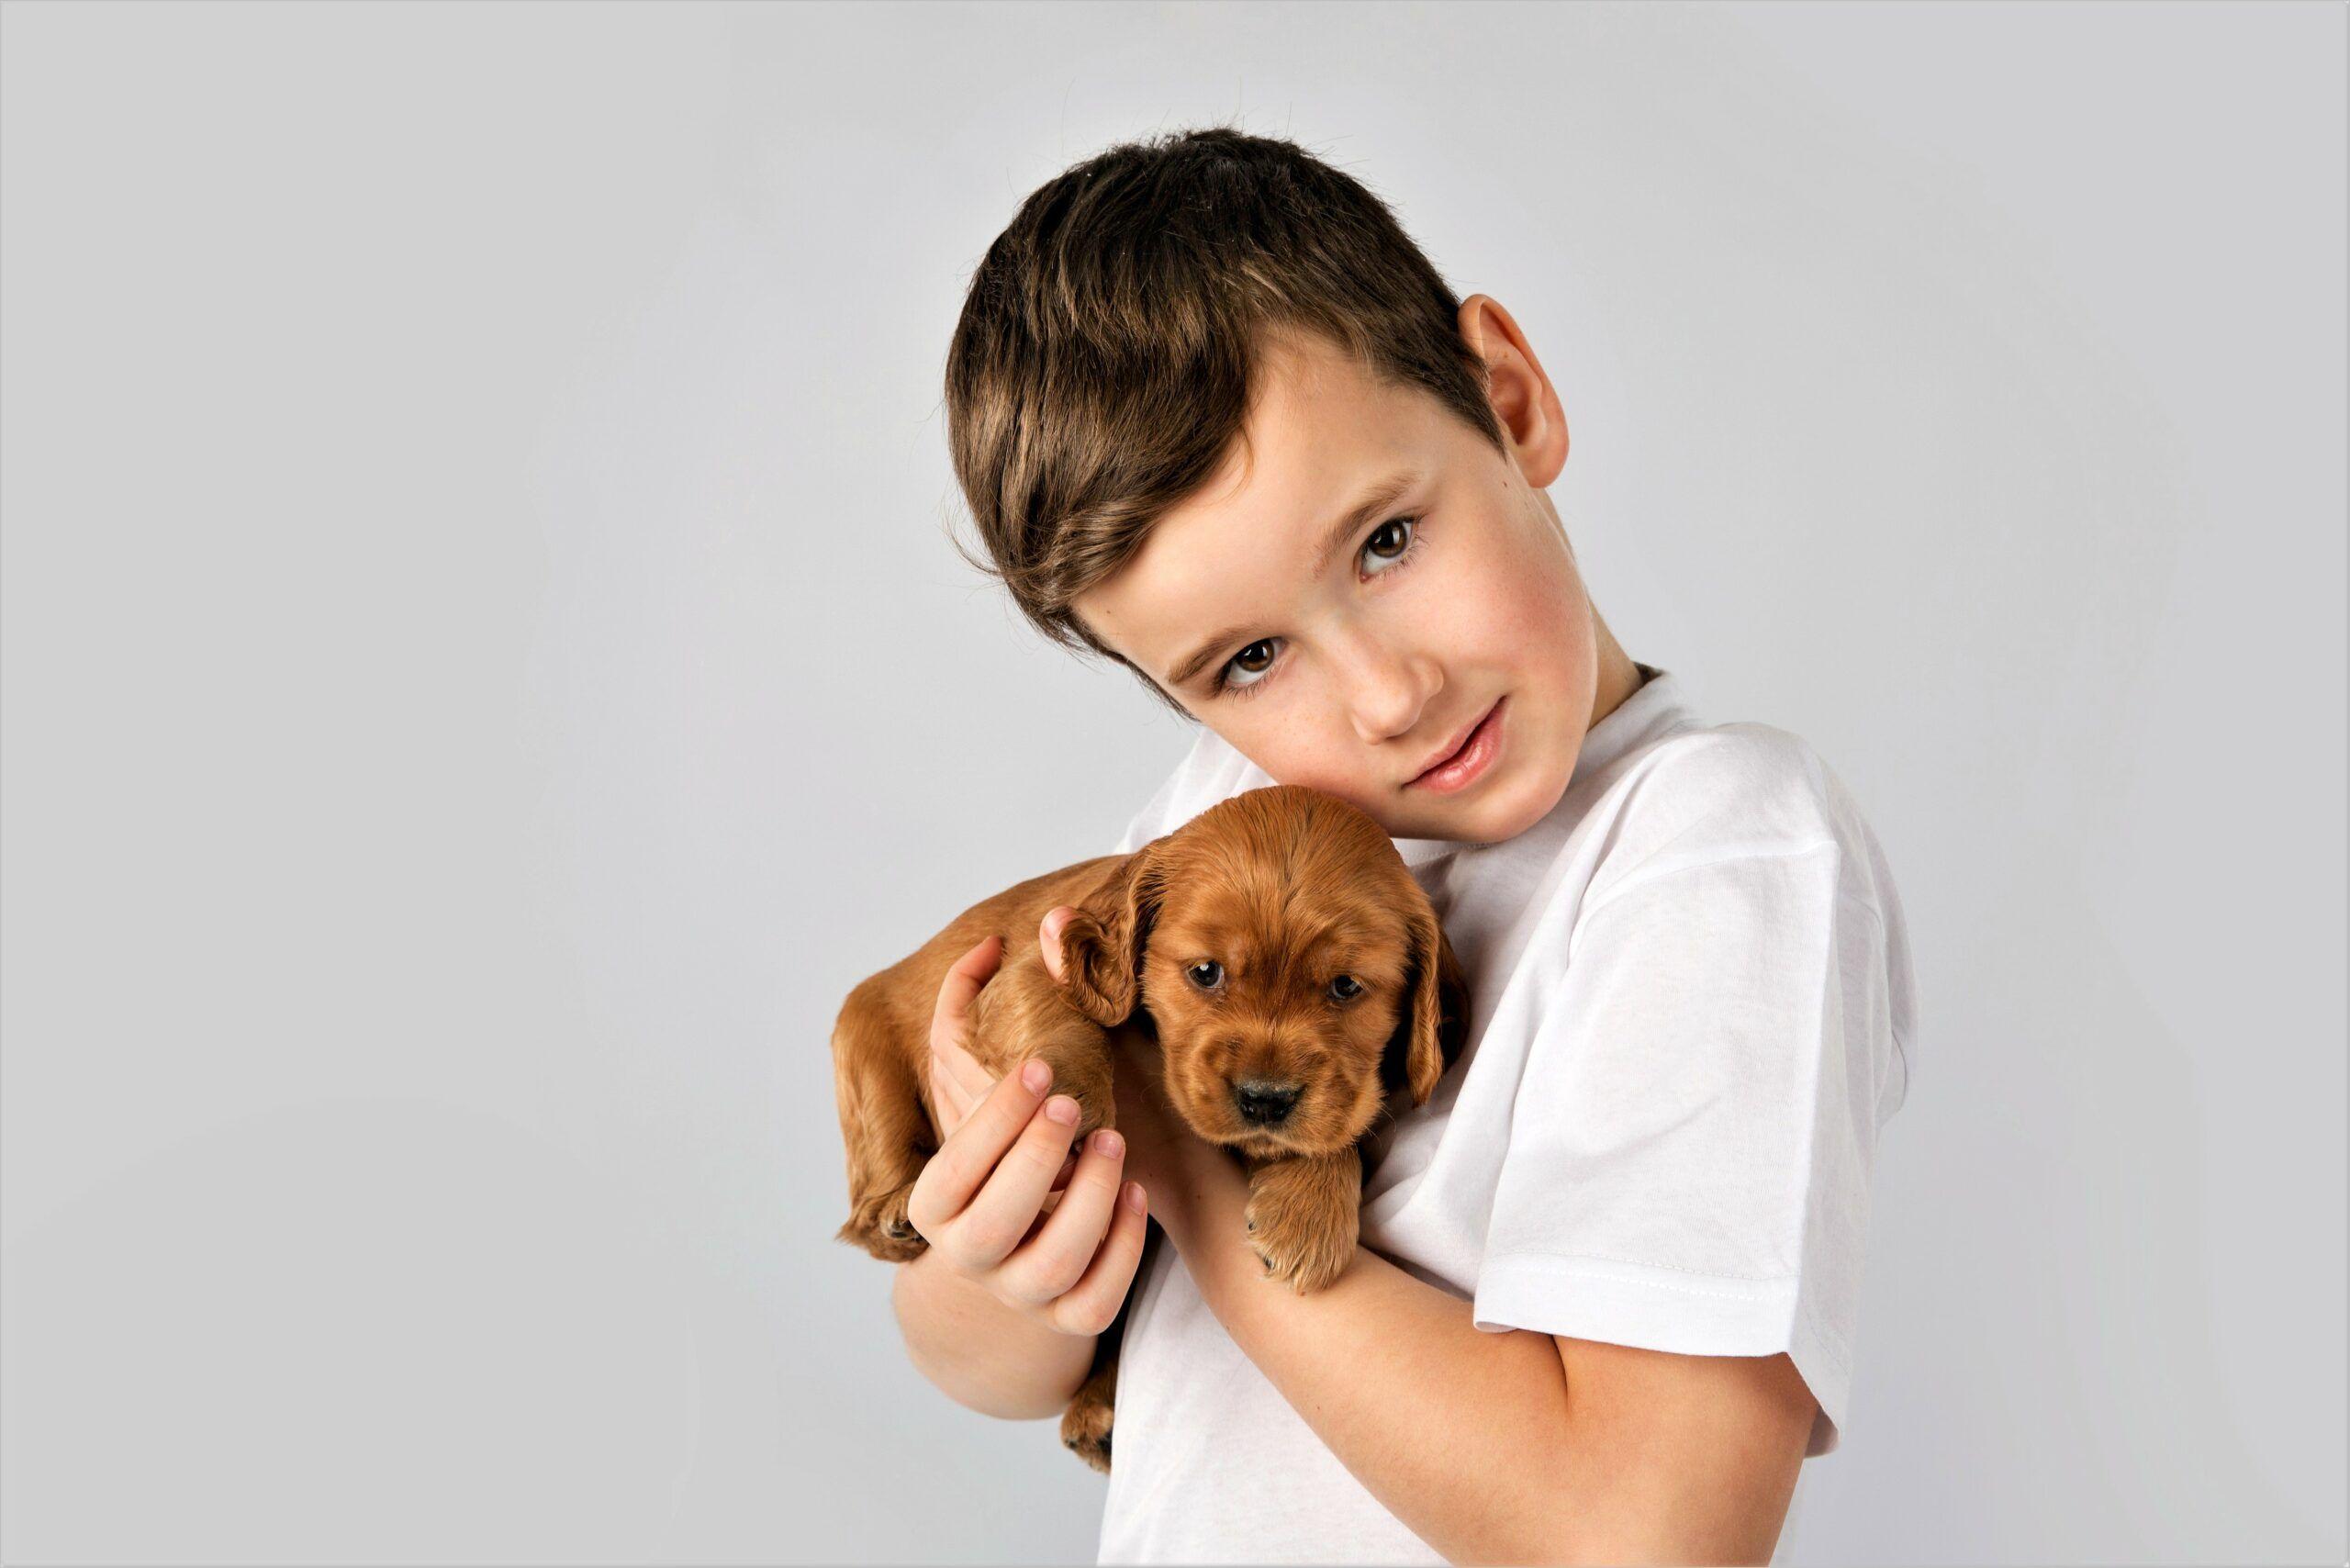 Cute Boy 4k Wallpaper Dog Care Canine Quality Dog